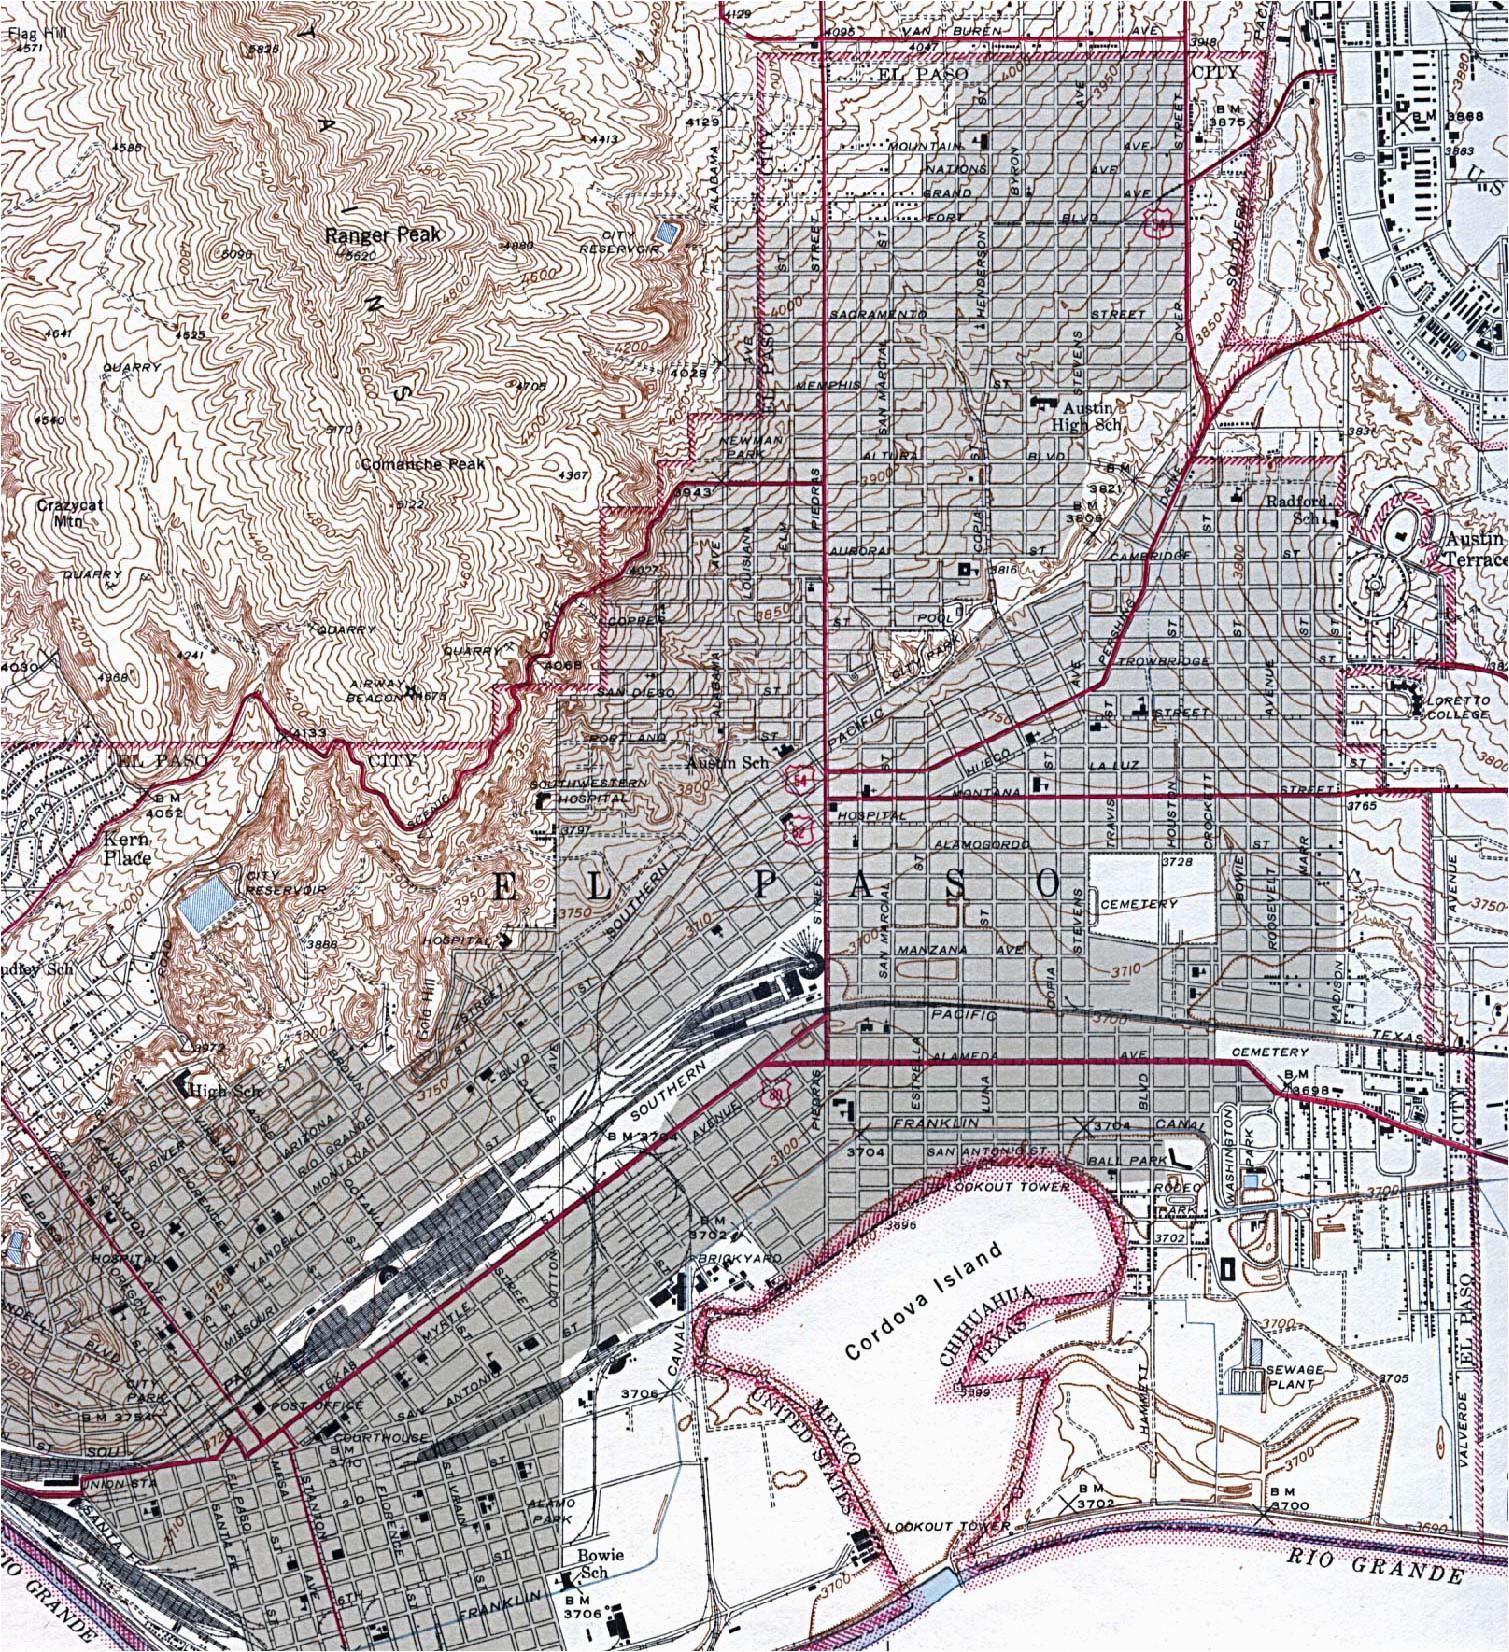 city map of el paso texas business ideas 2013